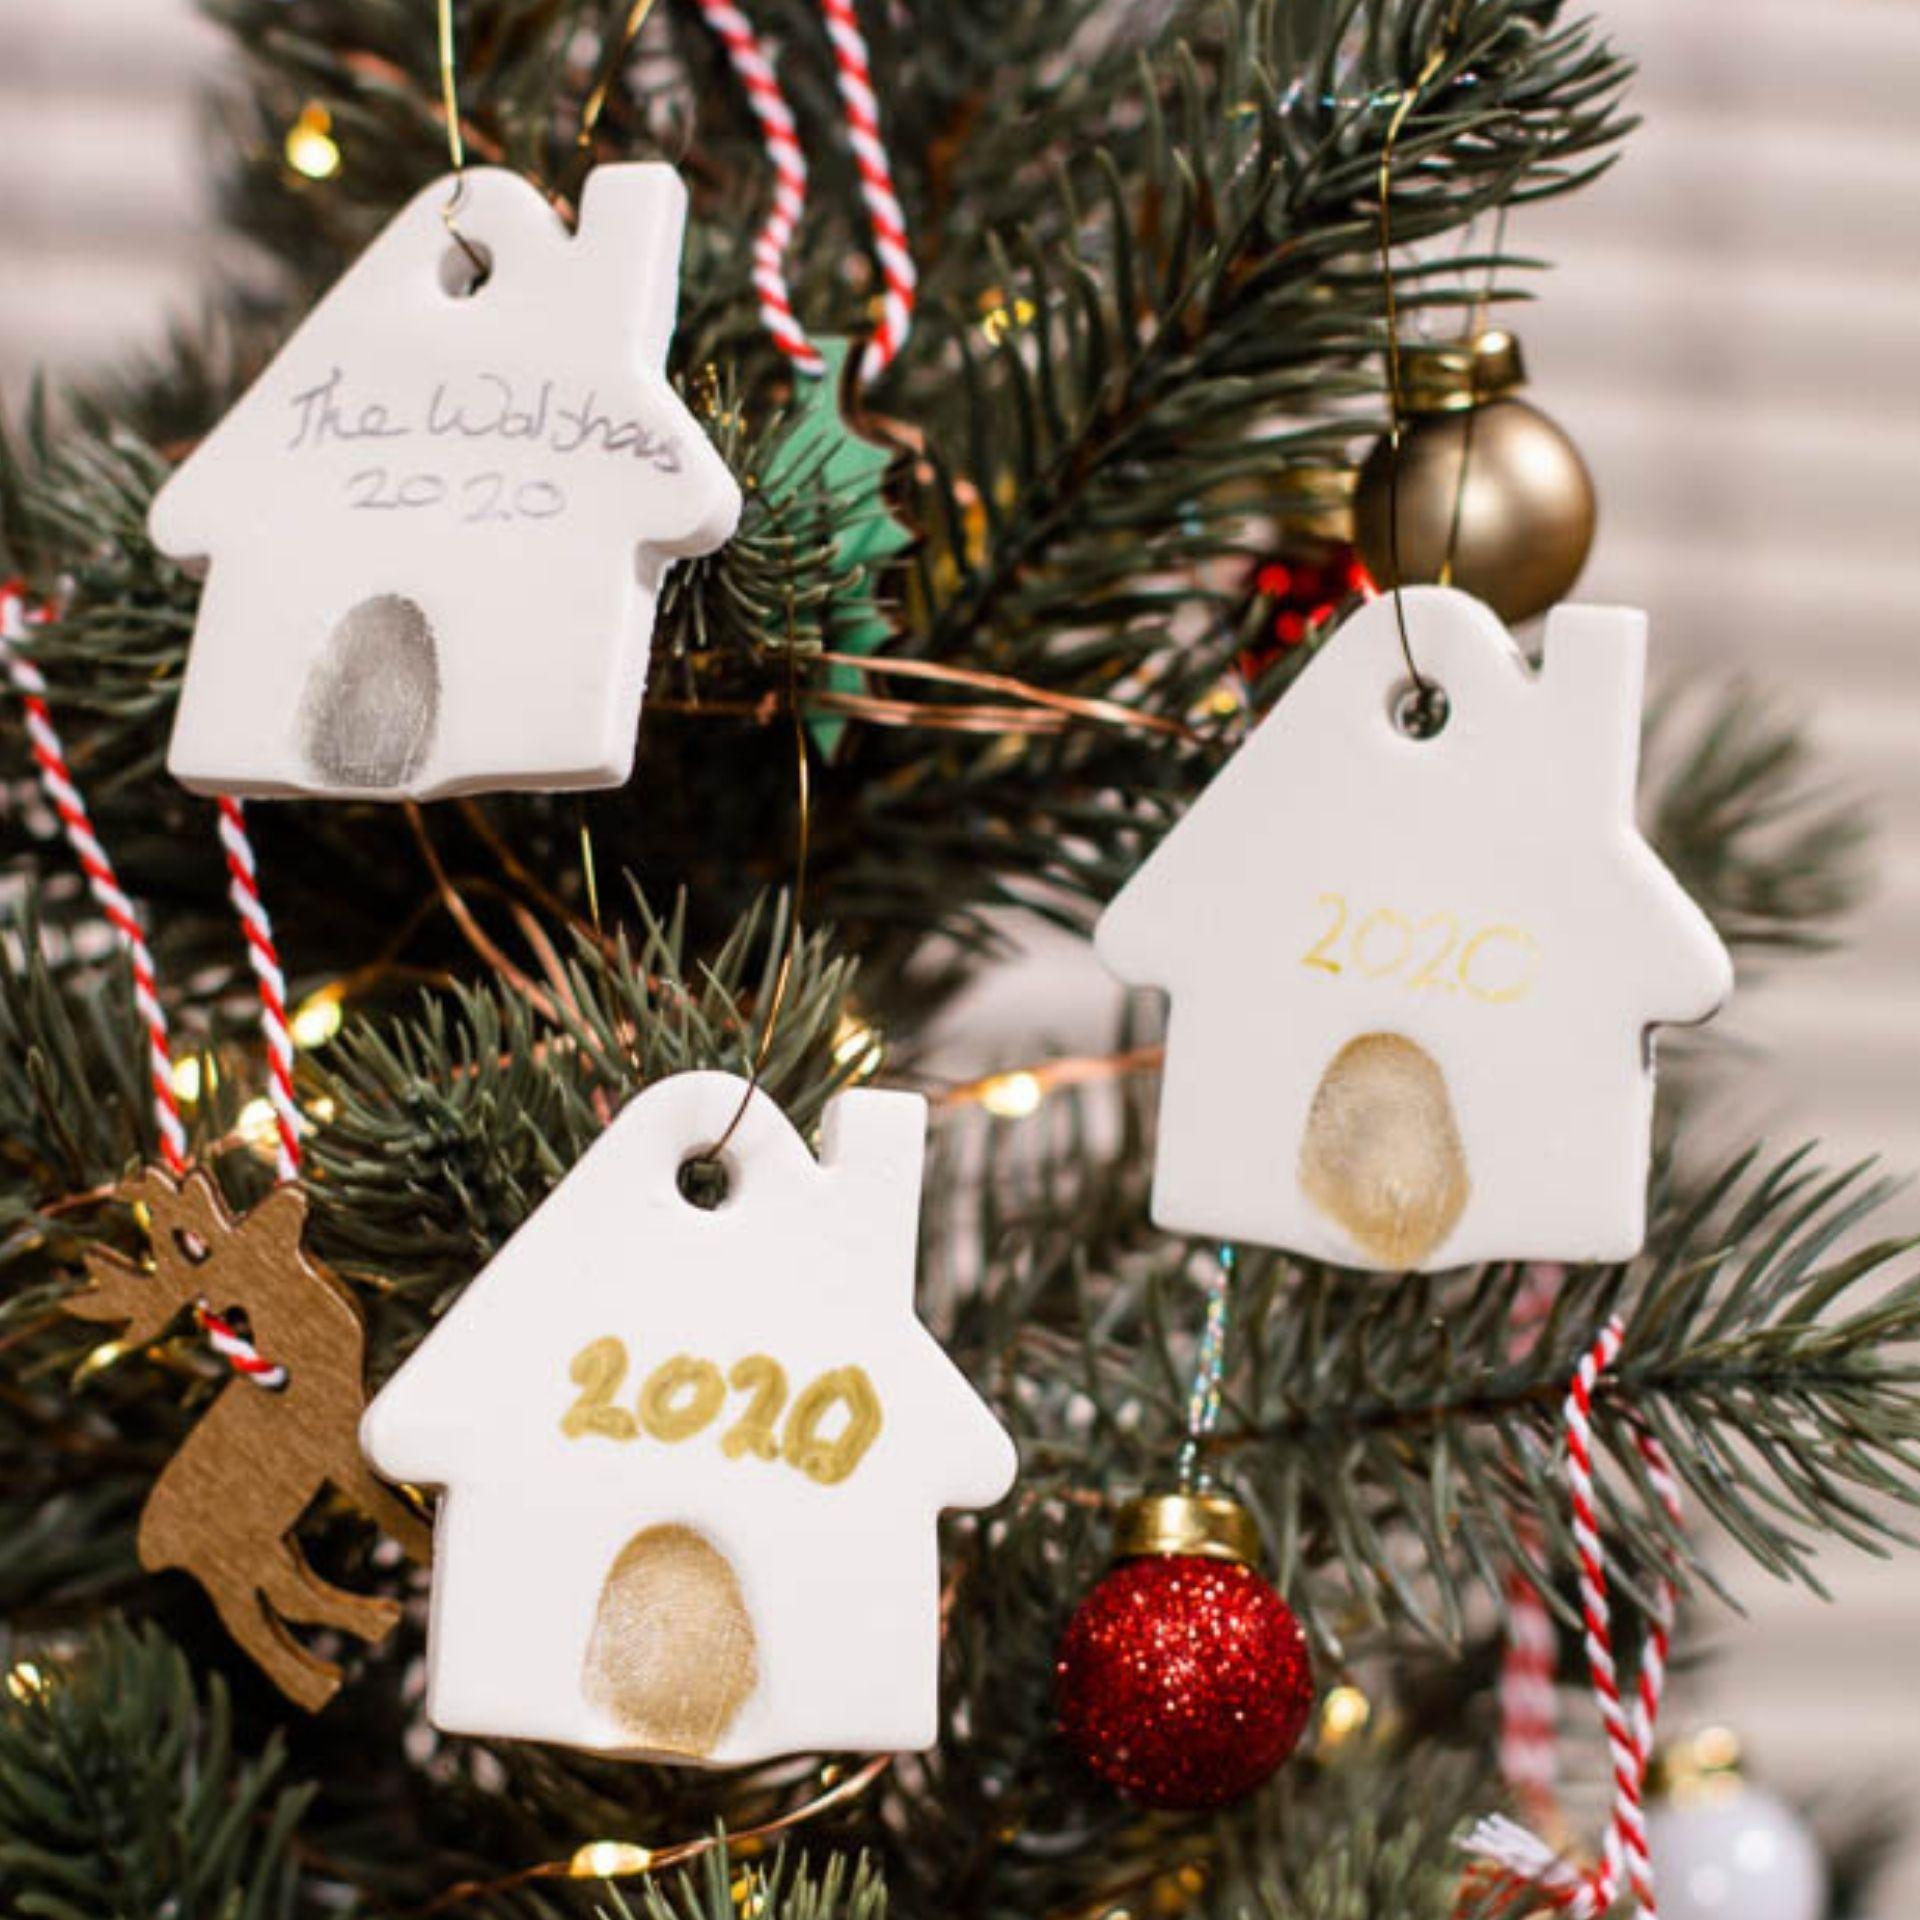 Fingerprint Christmas Tree Ornament Air Drying Clay In 2020 Christmas Crafts For Gifts Christmas Crafts For Kids Christmas Tree Decorations